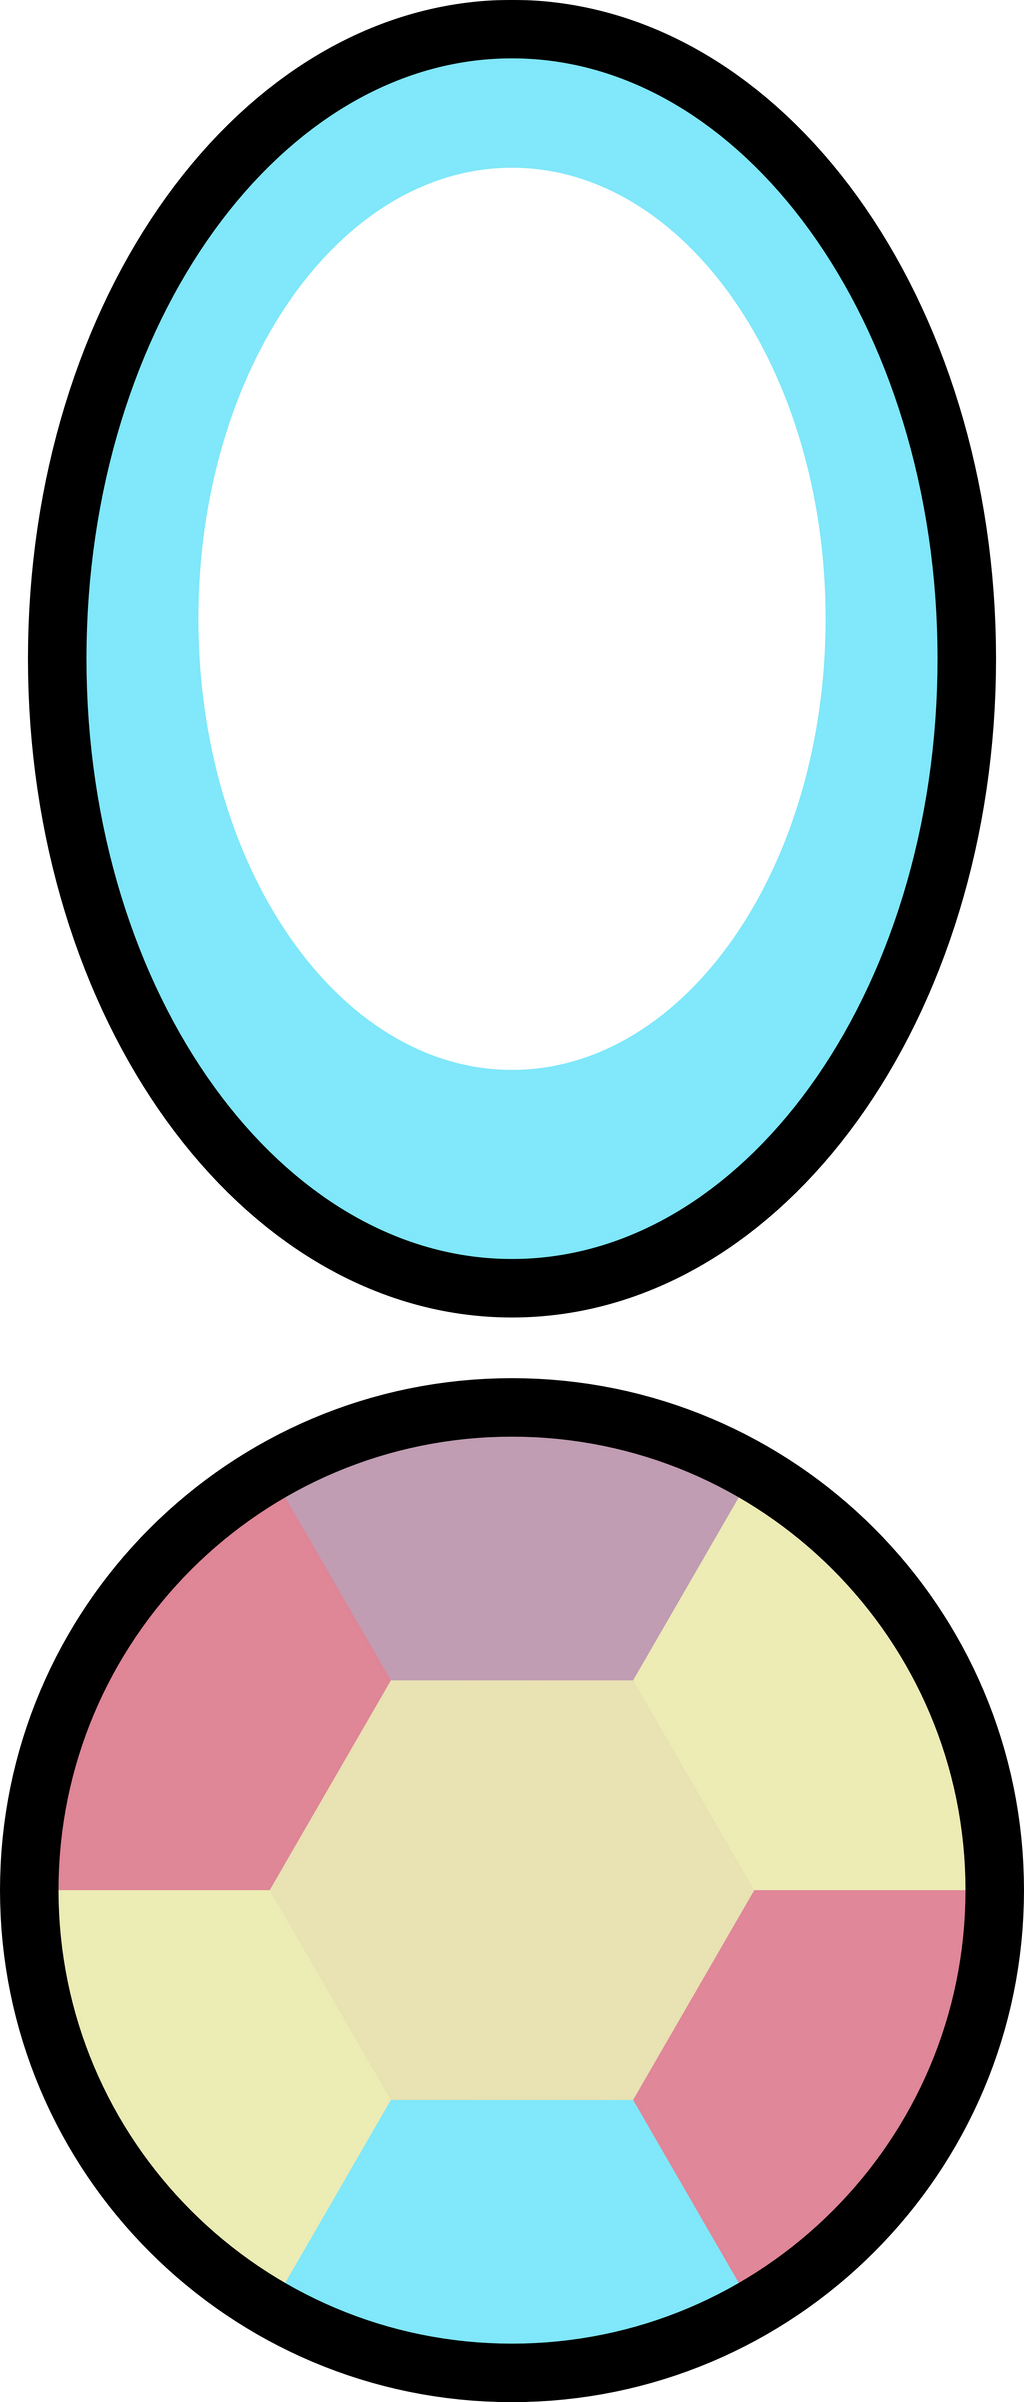 Steven Universe - Opal Vector by MrBarthalamul